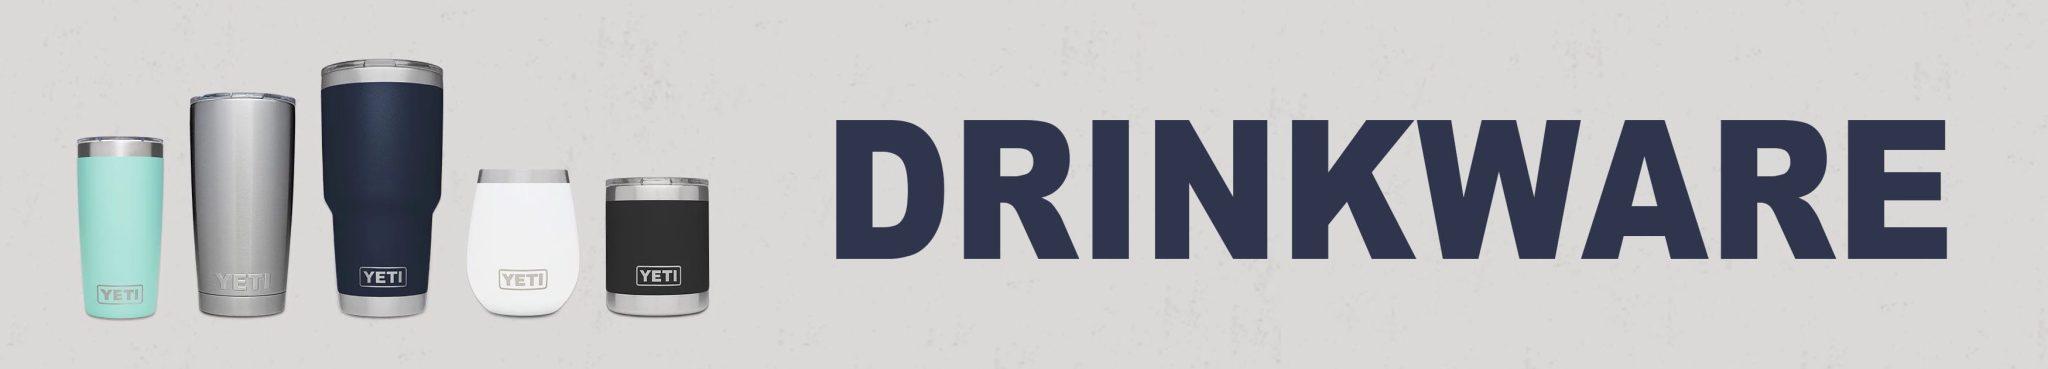 DRINKWARE-min